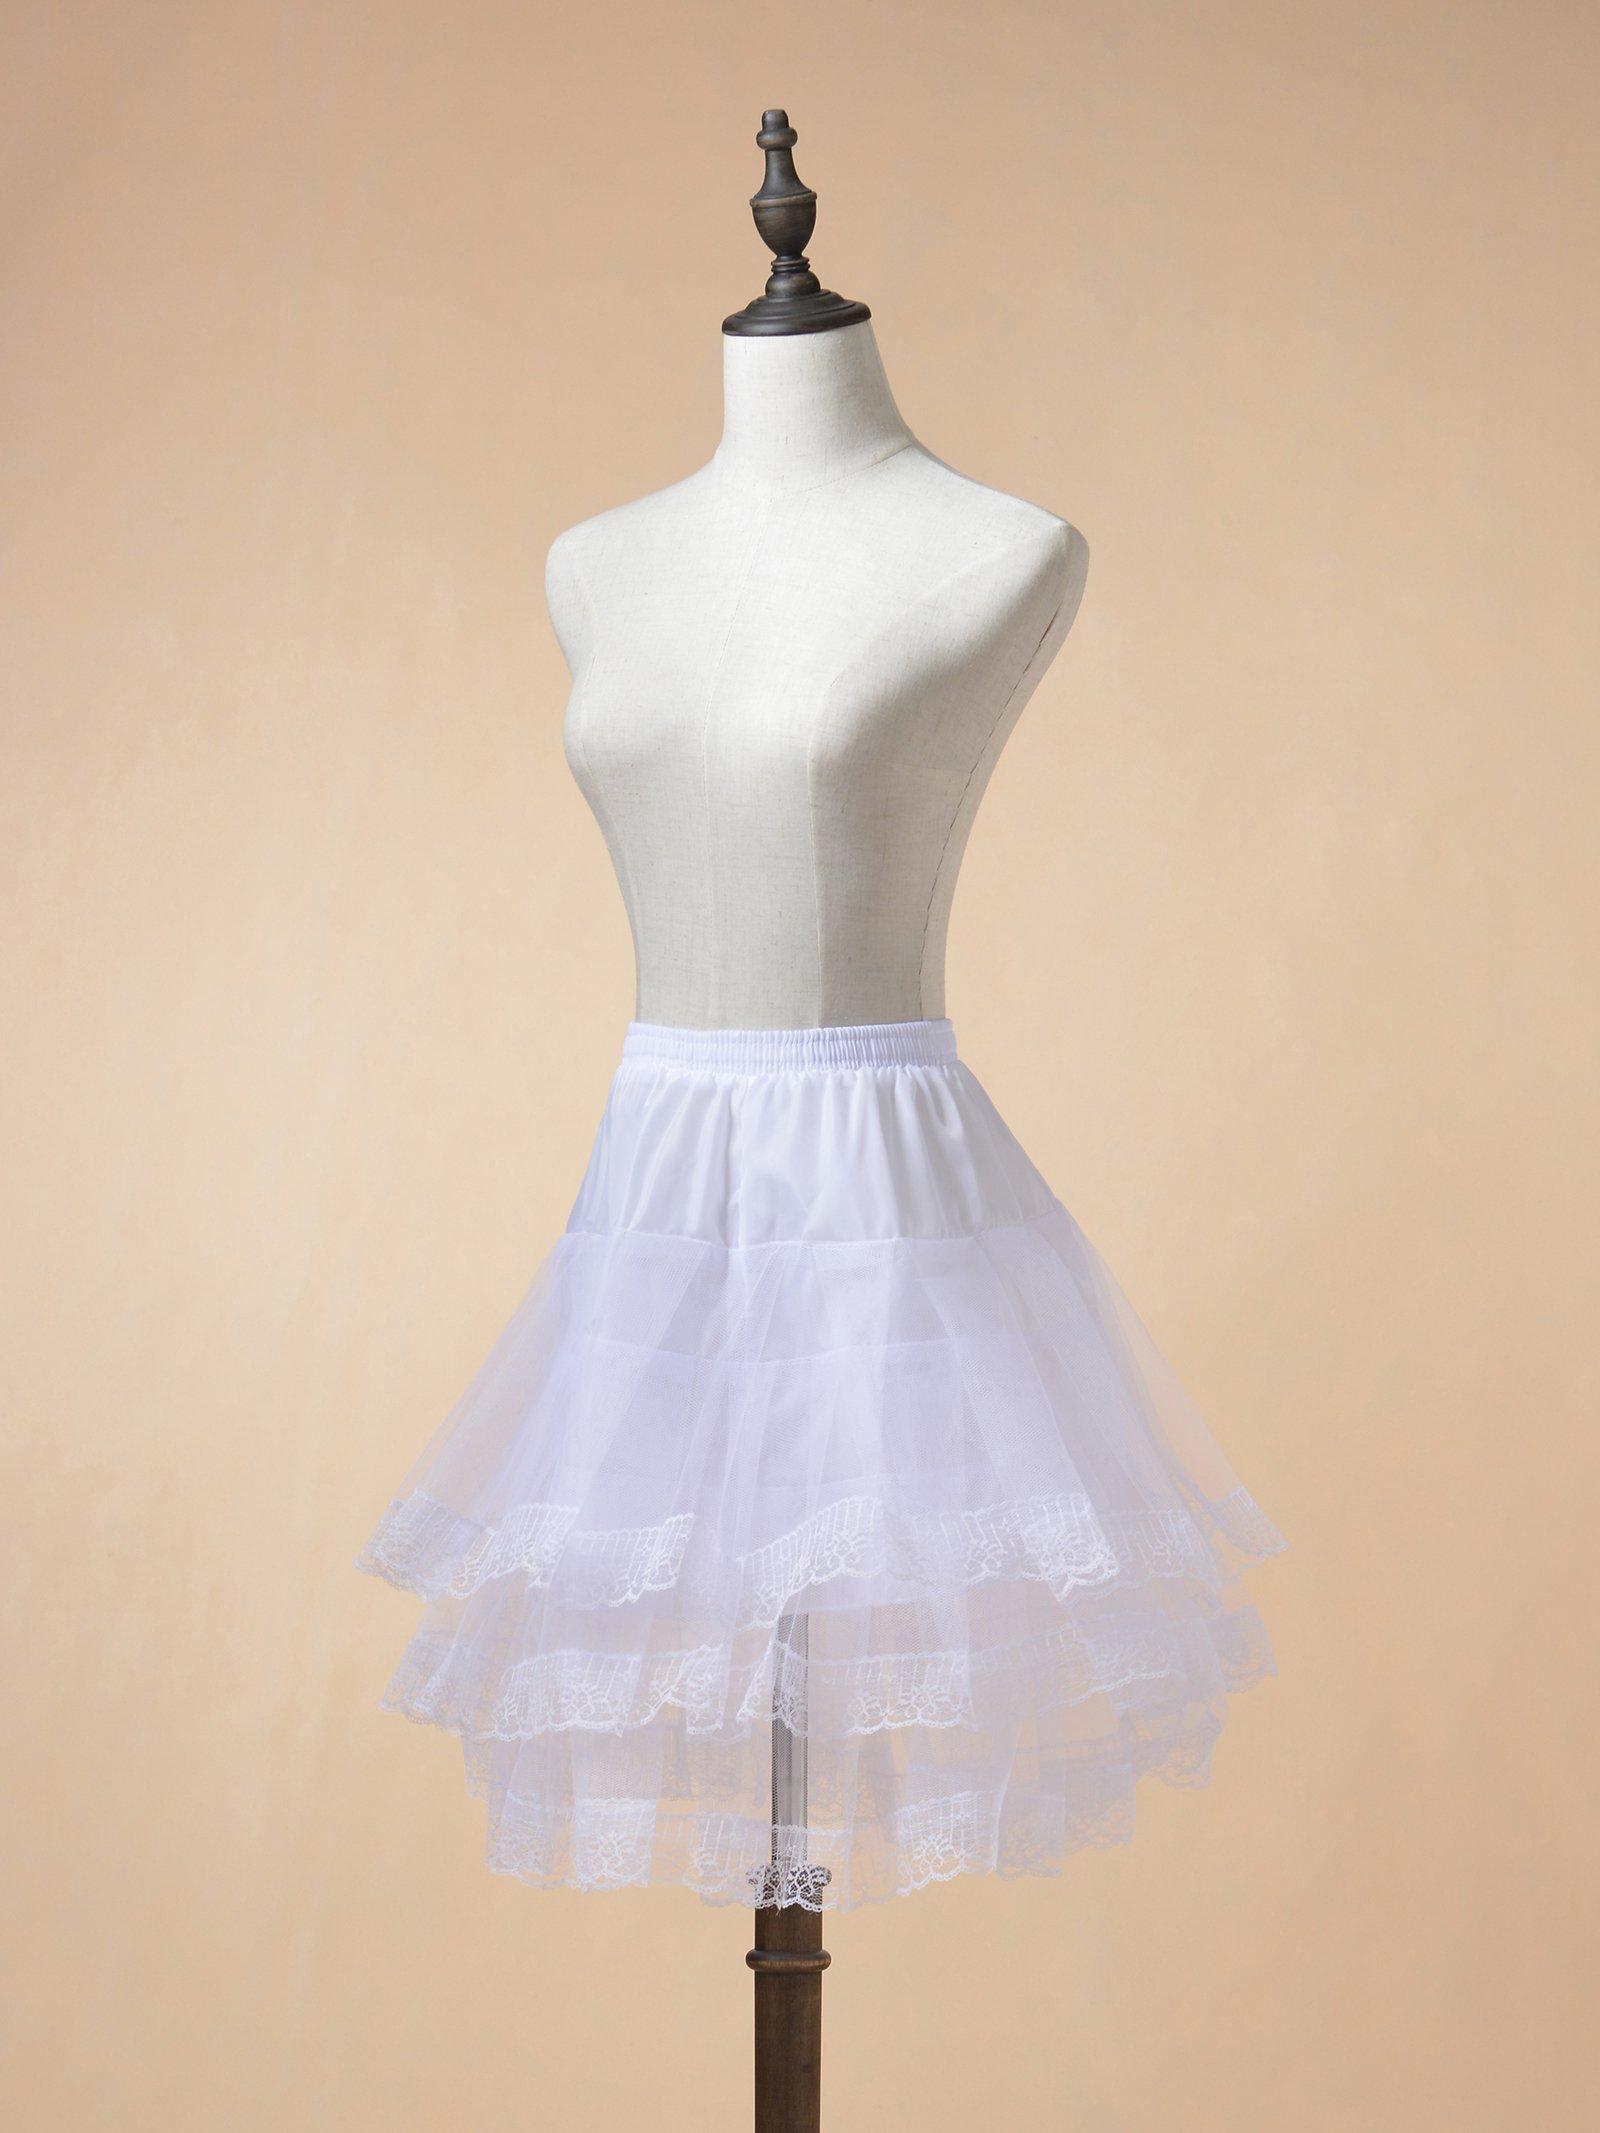 Remedios Kids Mini White Petticoat Flower Girl Wedding Underskirt Cocktail Dress Crinoline Slip White by Remedios (Image #3)